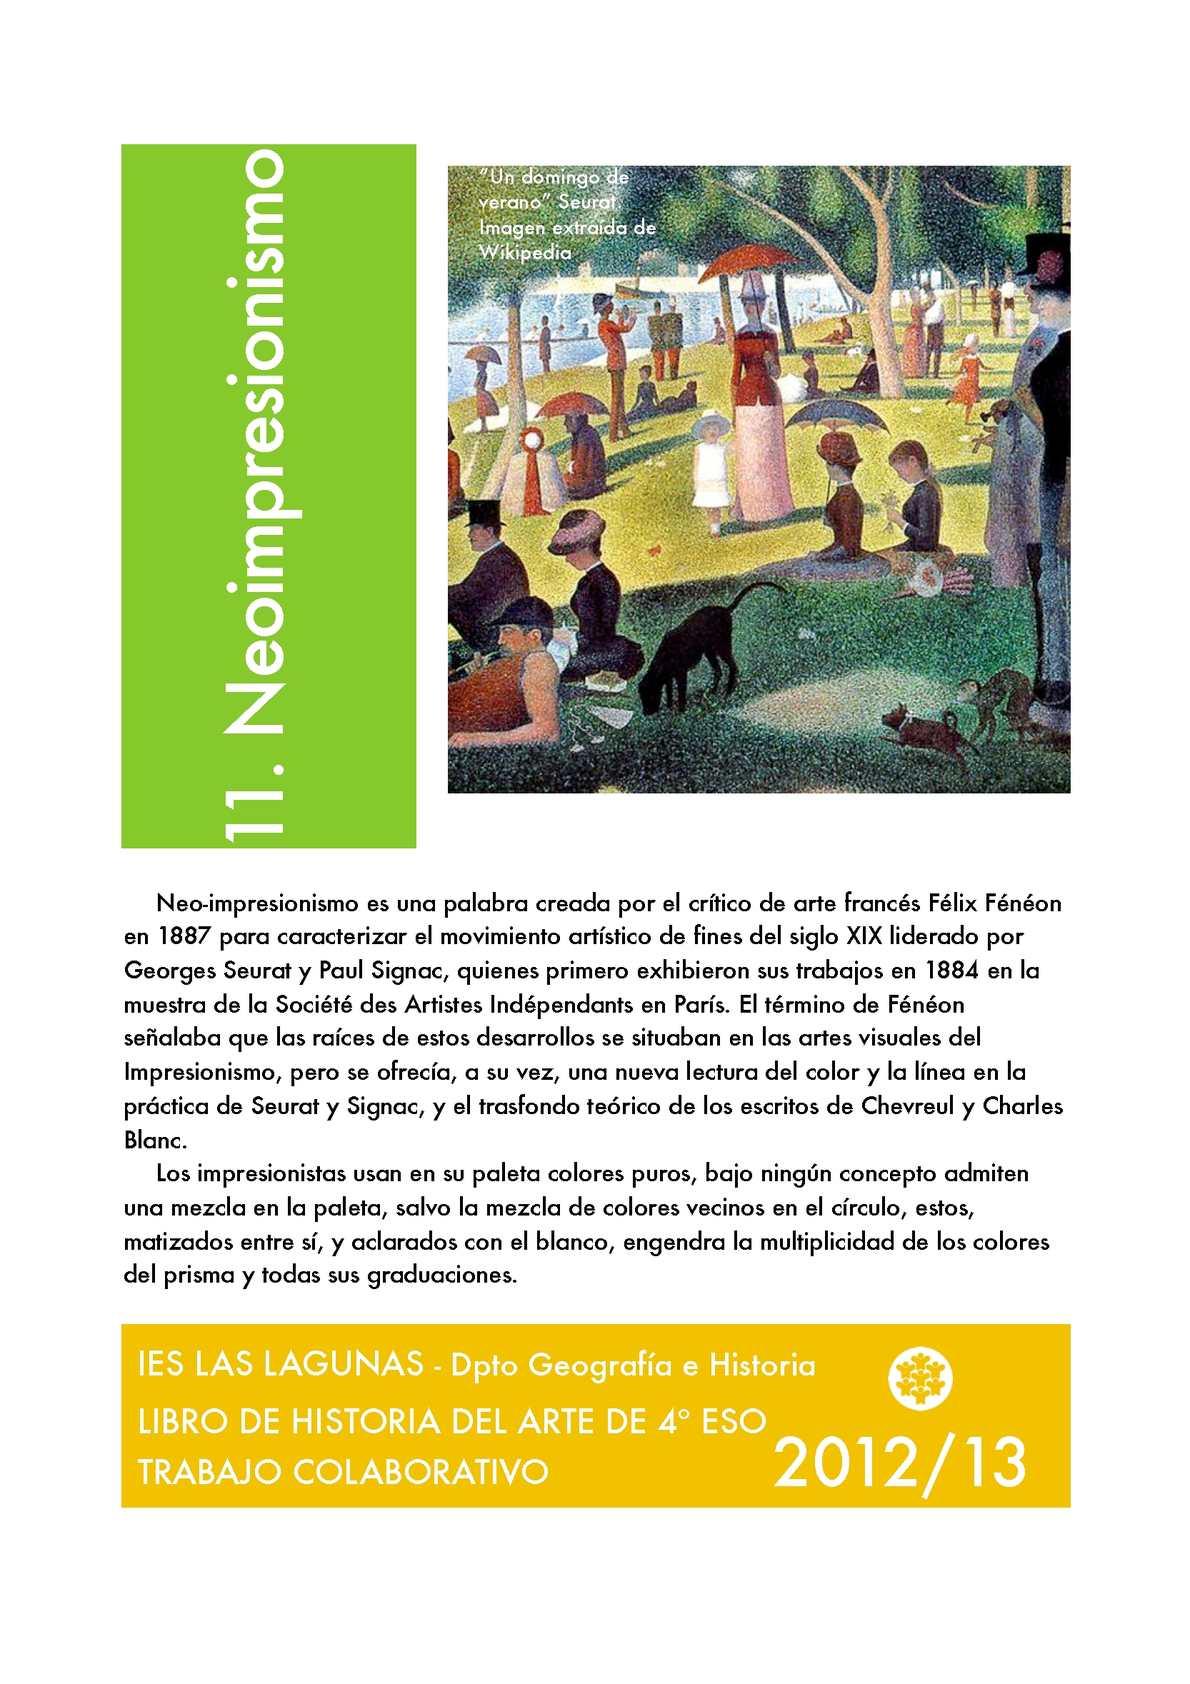 Calaméo - Libro Historia del arte 4º ESO Vol. 2 Curso 2012/13